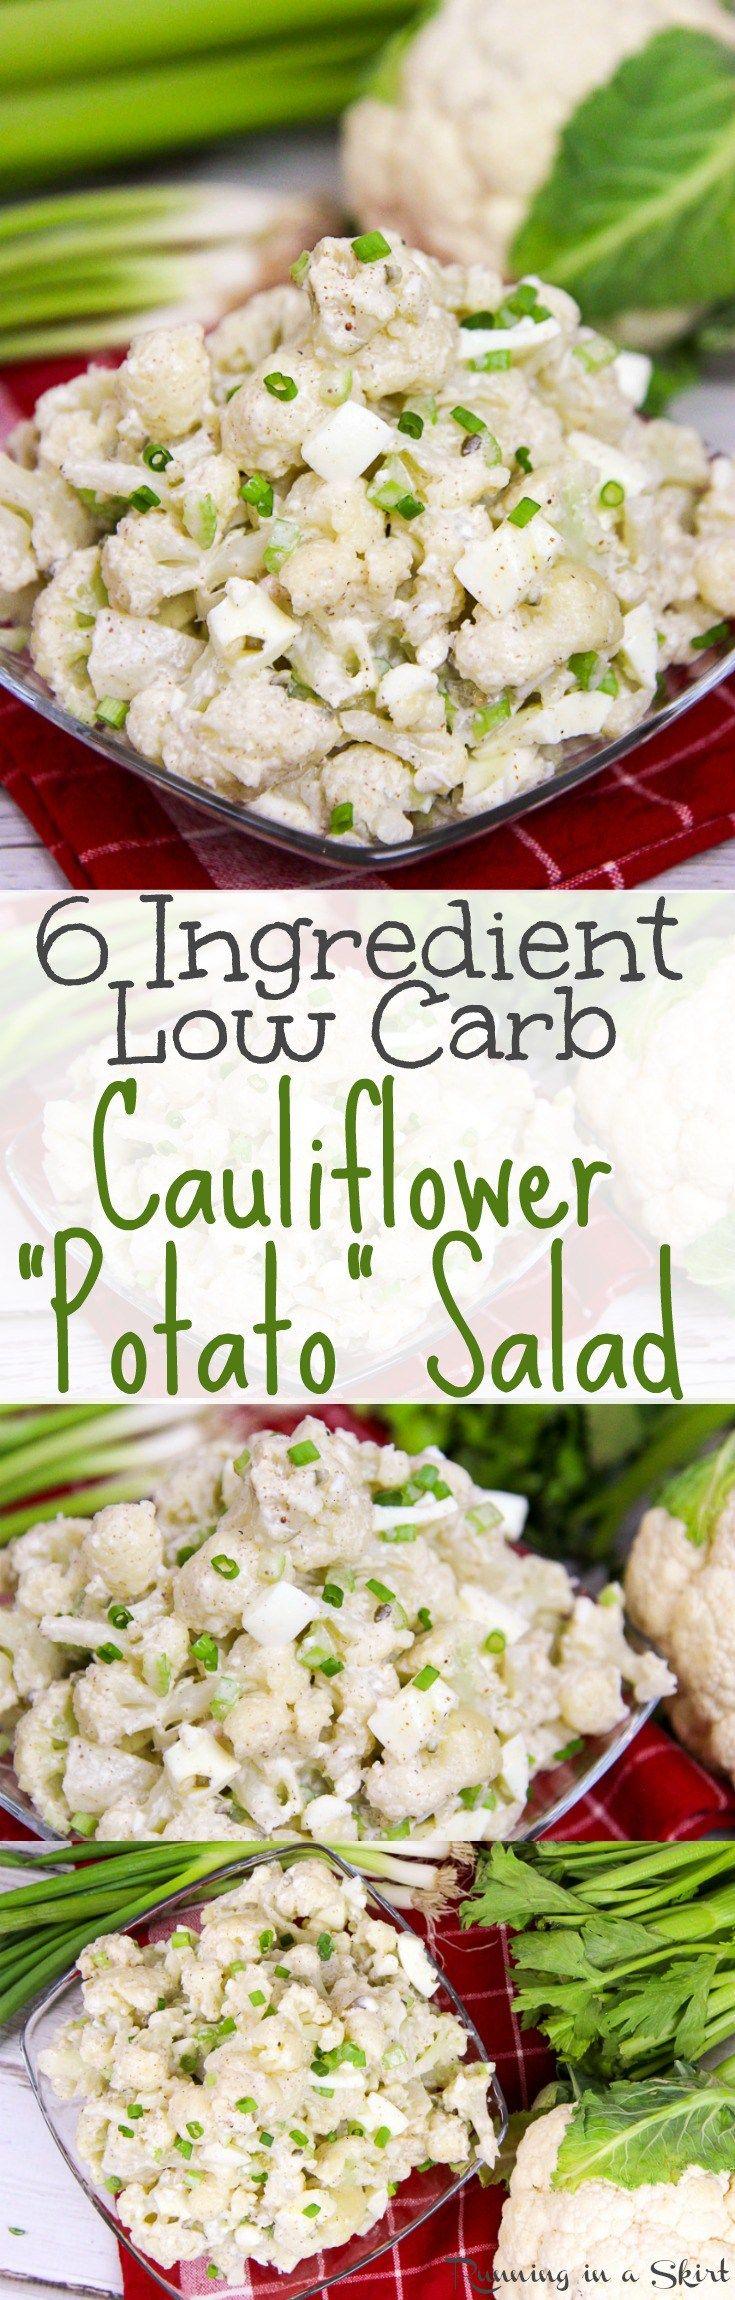 who made the potatoe salad movie online